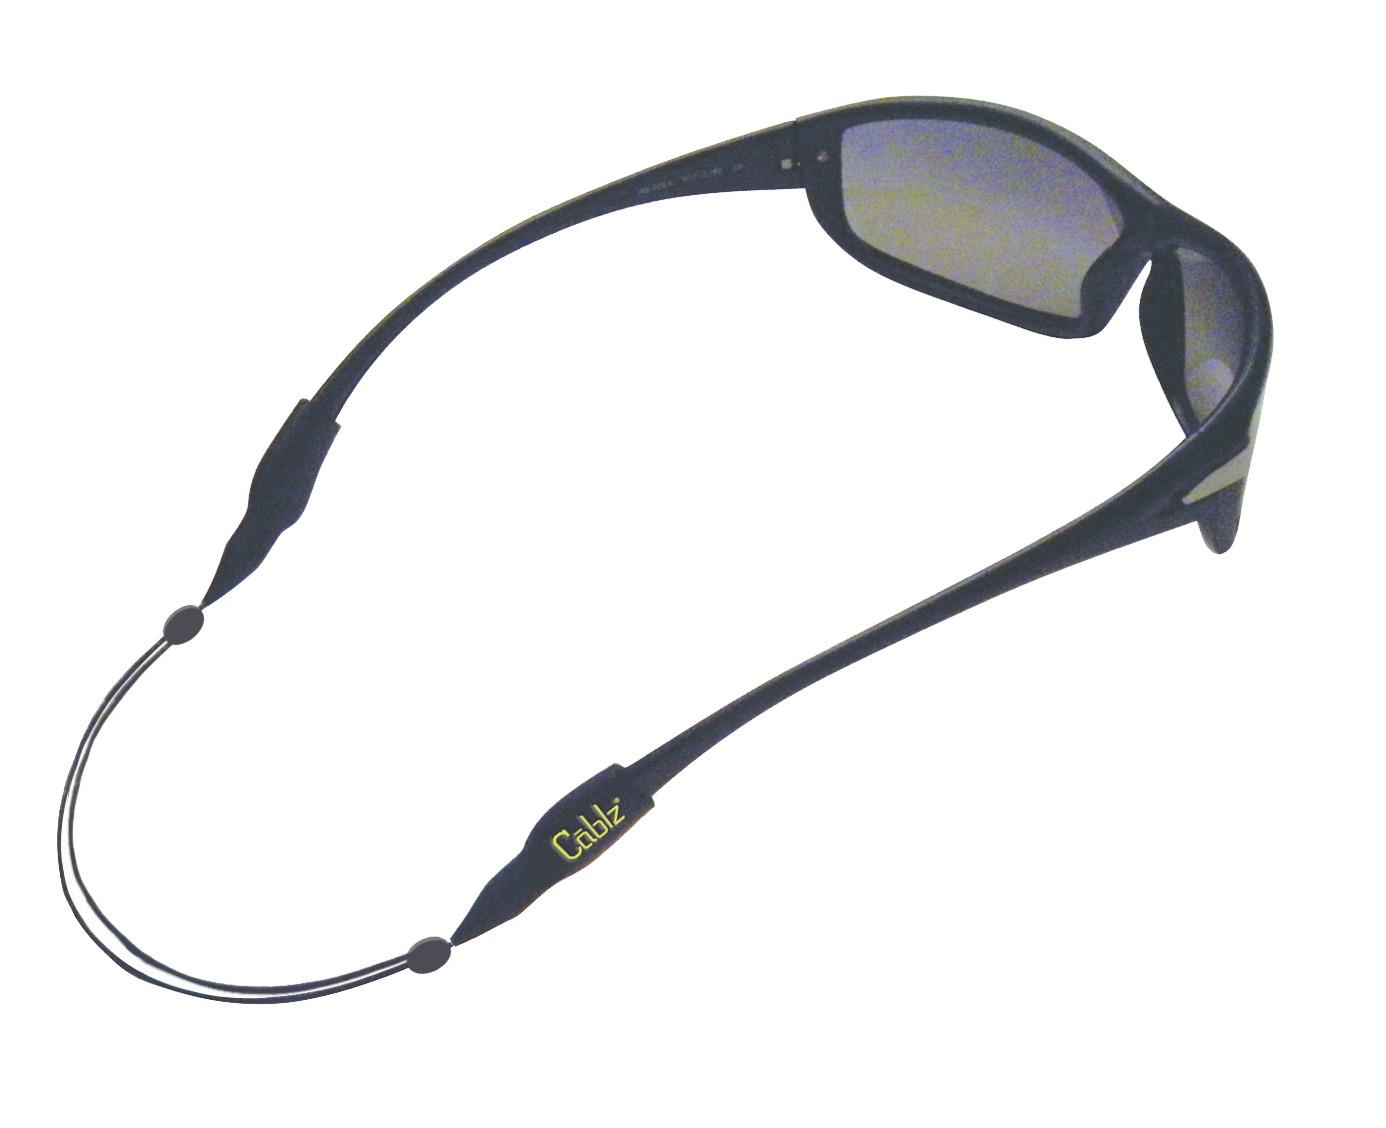 Cablz ZIPZB14 Adjustable Eyewear Holder 14